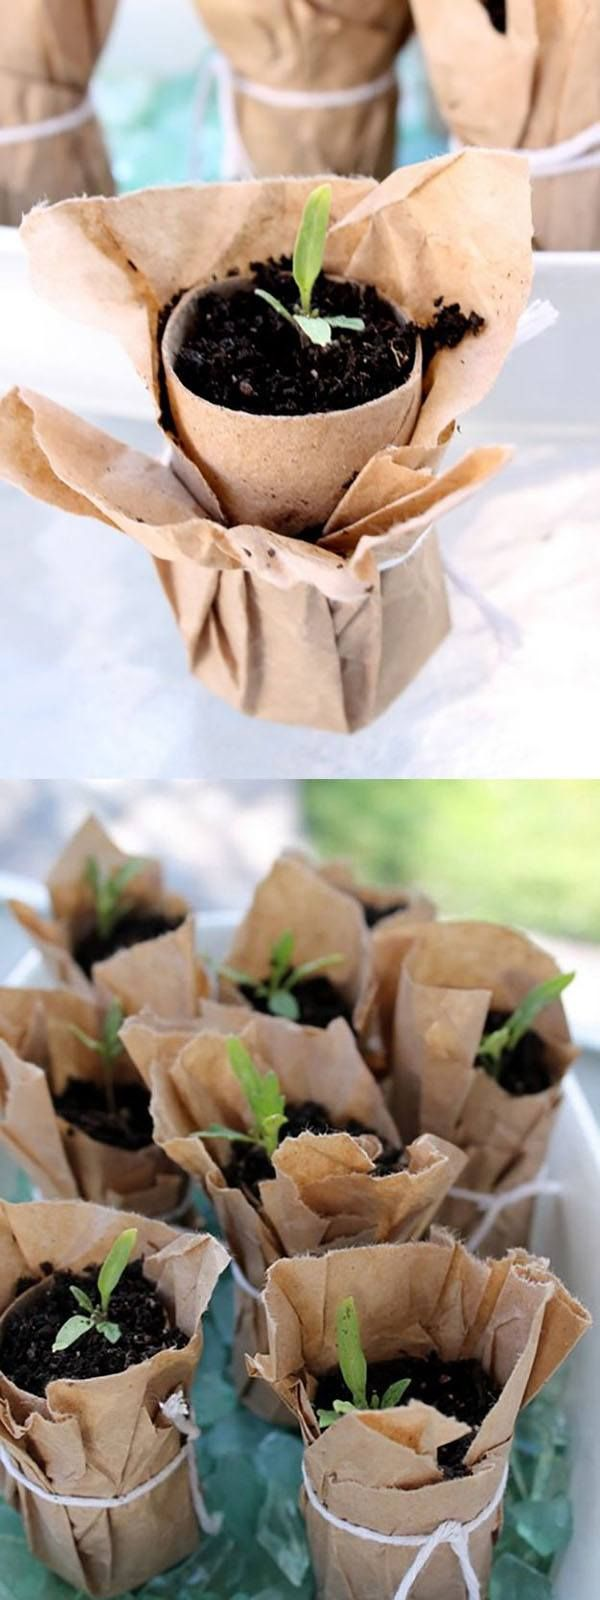 Brown Paper Seedling Pot